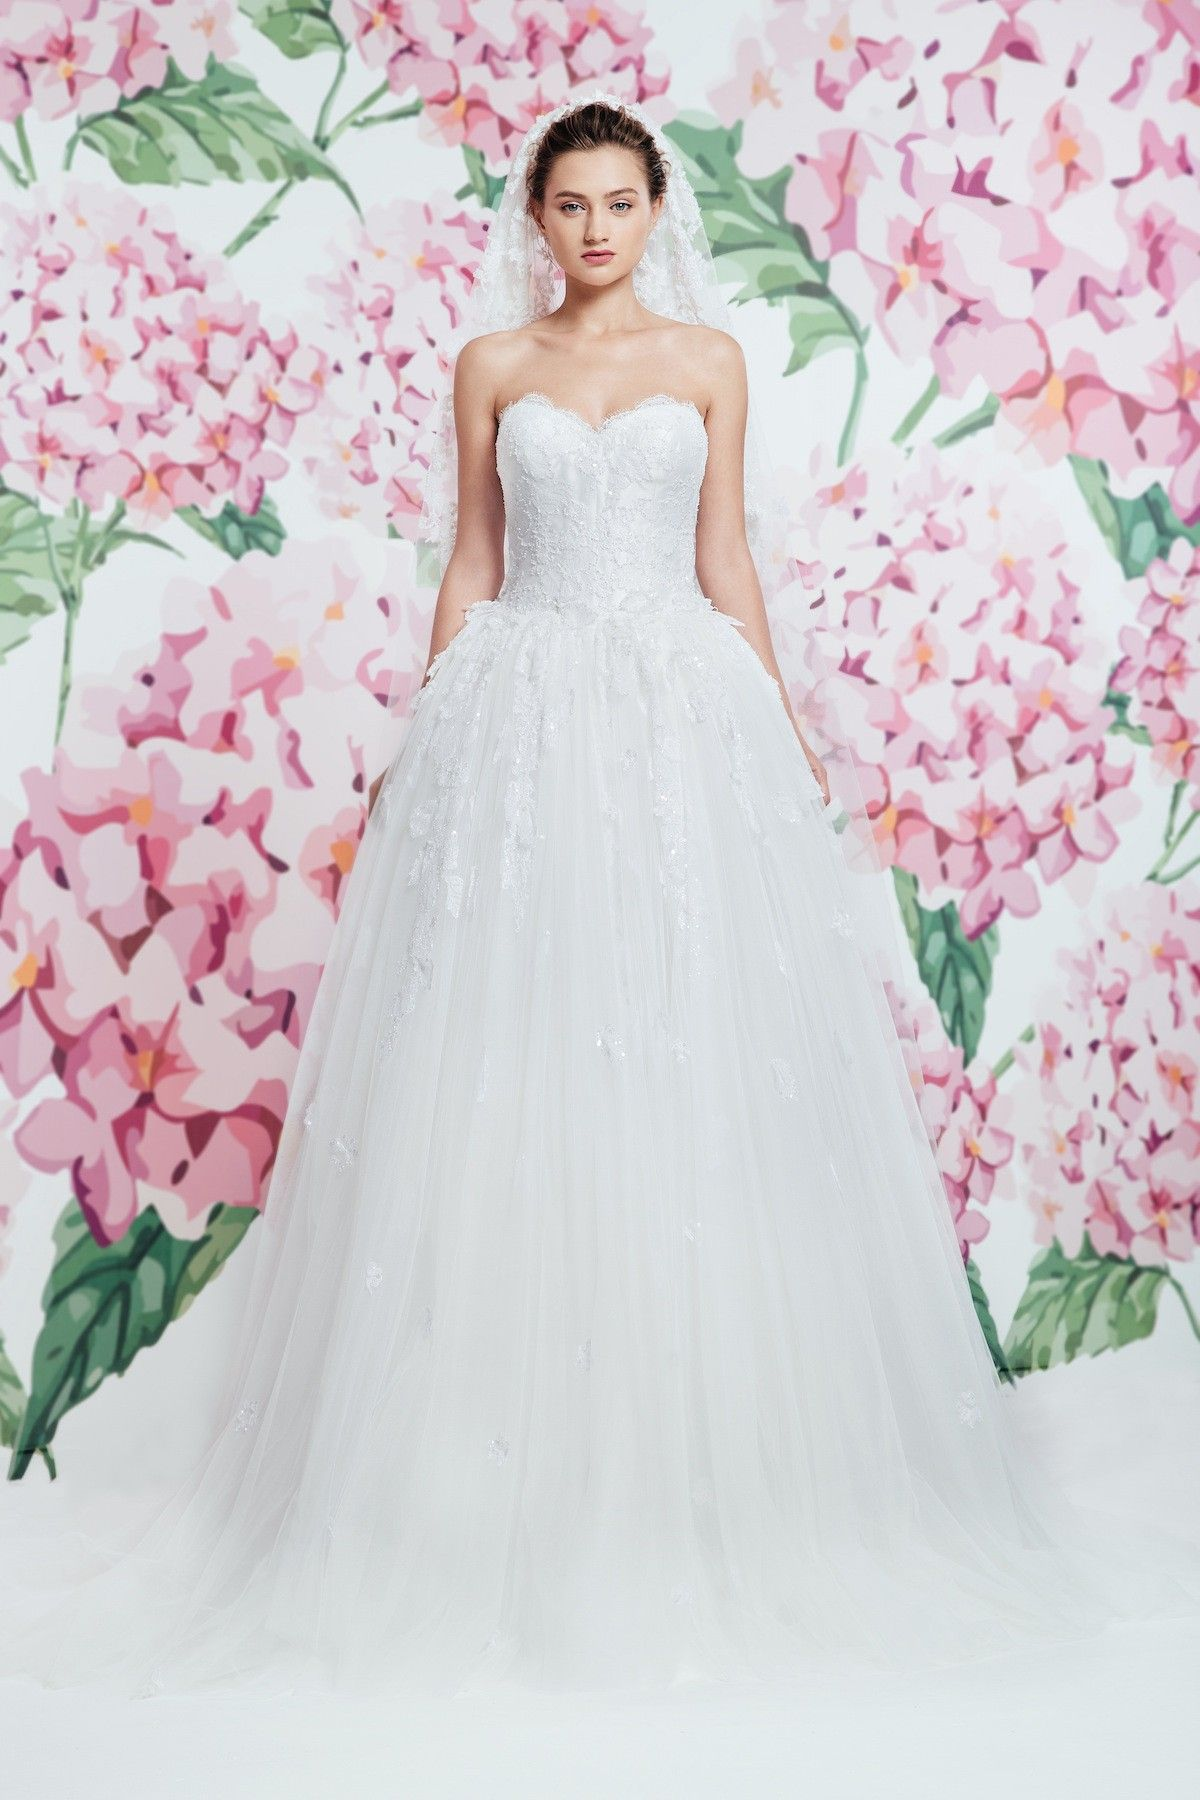 Berta fashion dress collection spring wedding dress